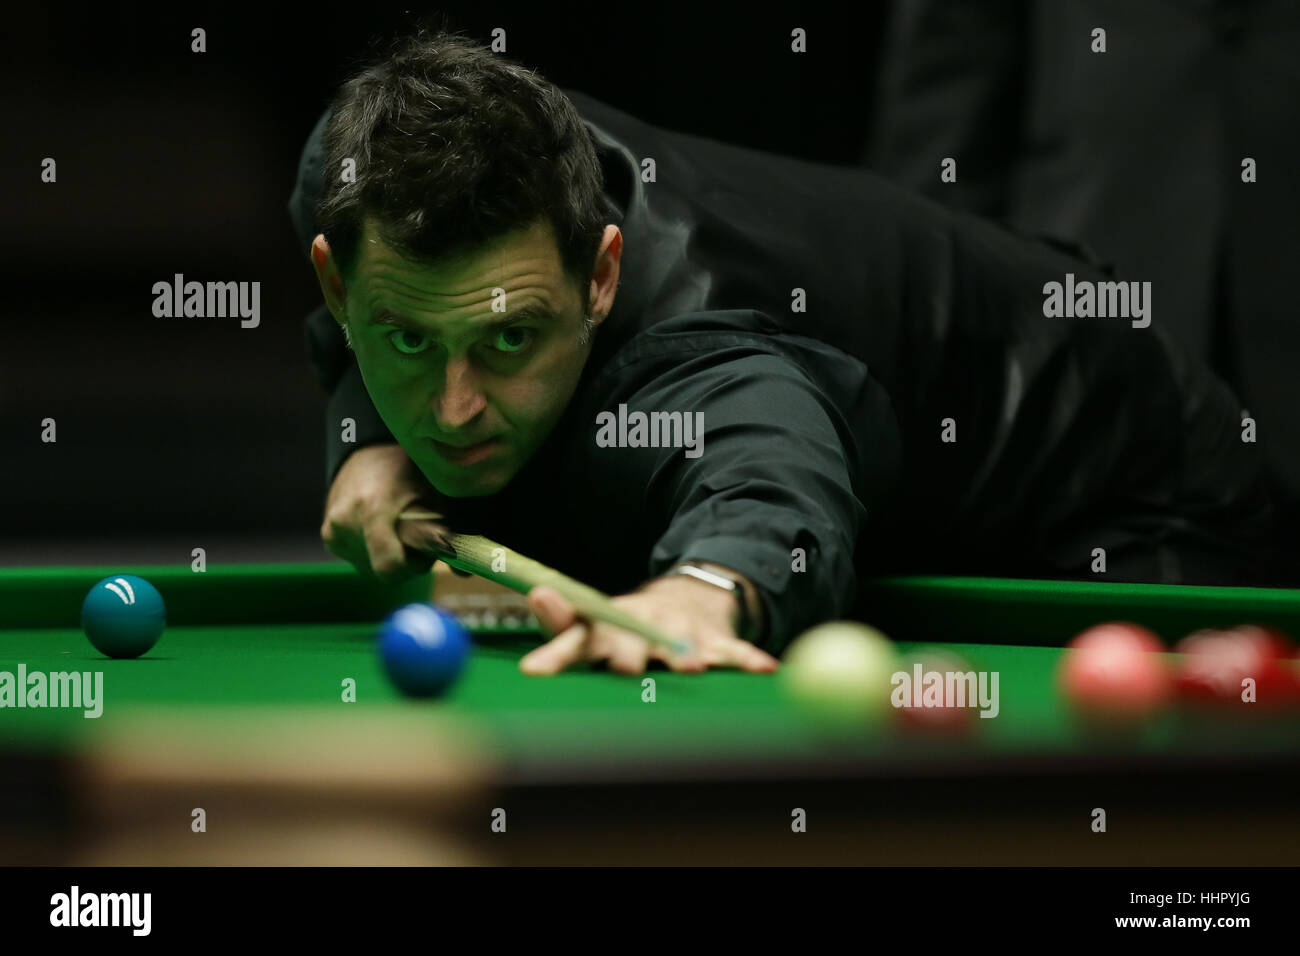 Londres, Reino Unido. 19 ene, 2017. Ronnie O'Sullivan de Inglaterra golpea la bola durante el quarterfinal coinciden Imagen De Stock